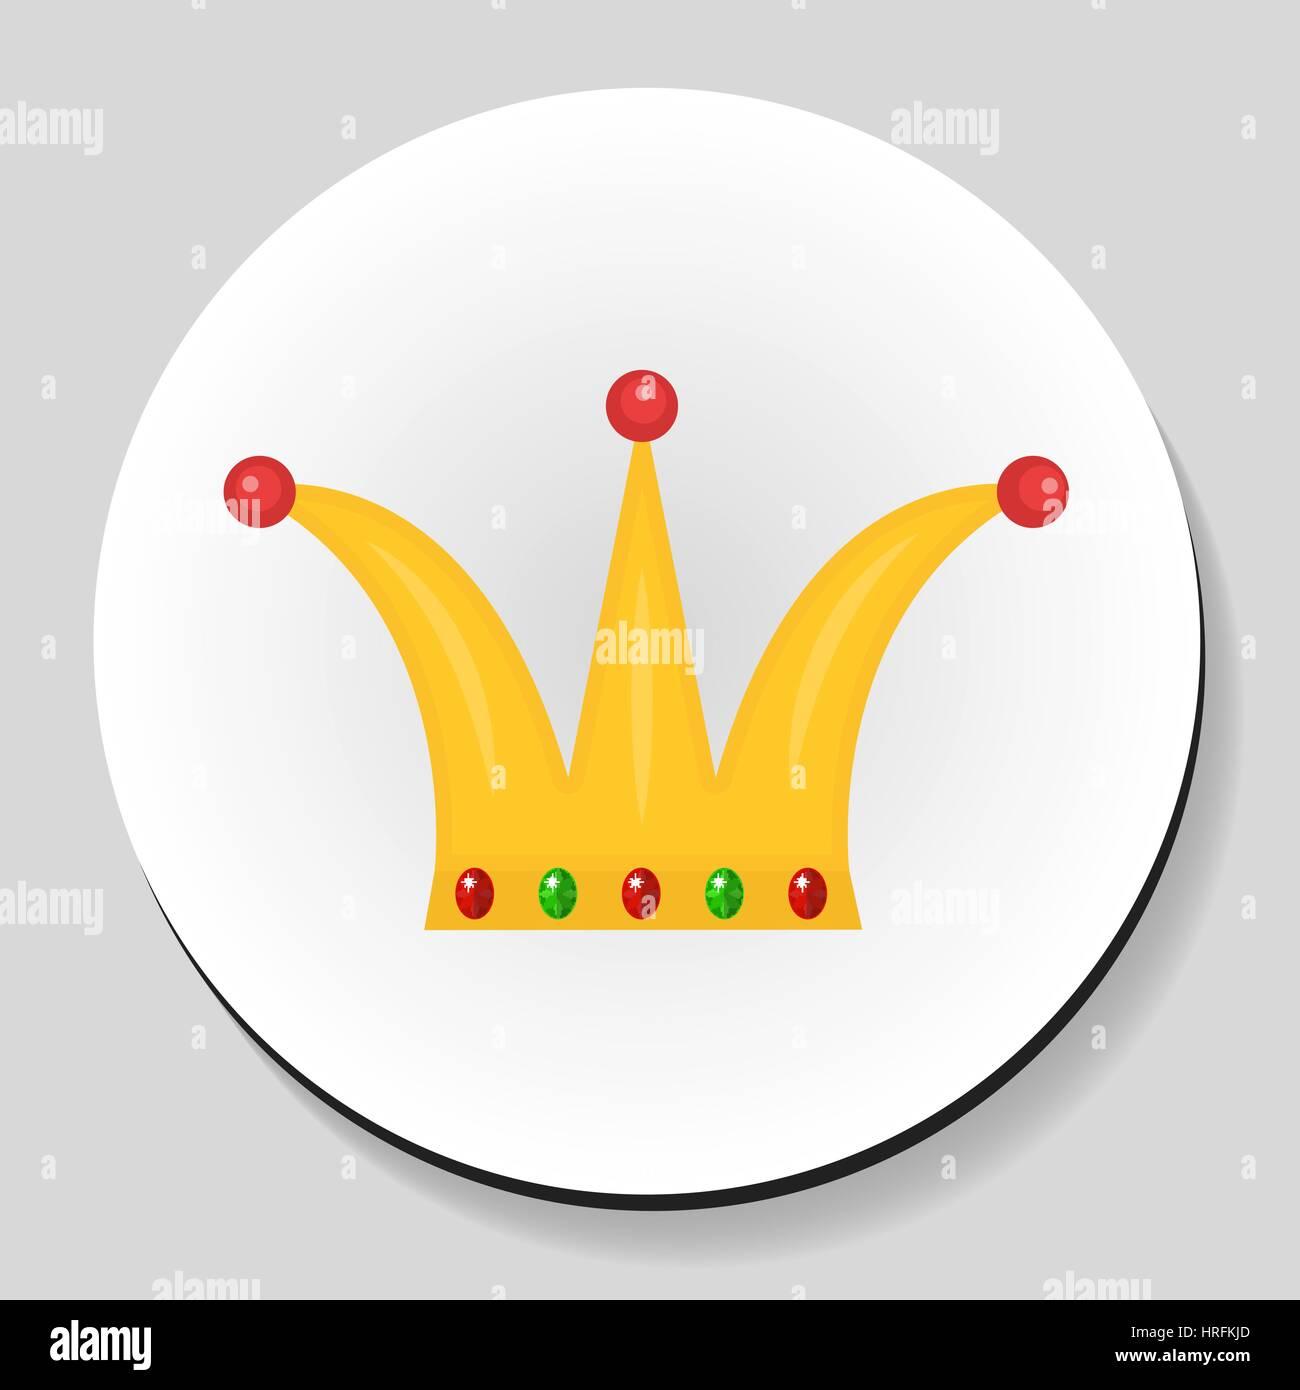 Golden Crown sticker icon flat style. Vector illustration. - Stock Vector